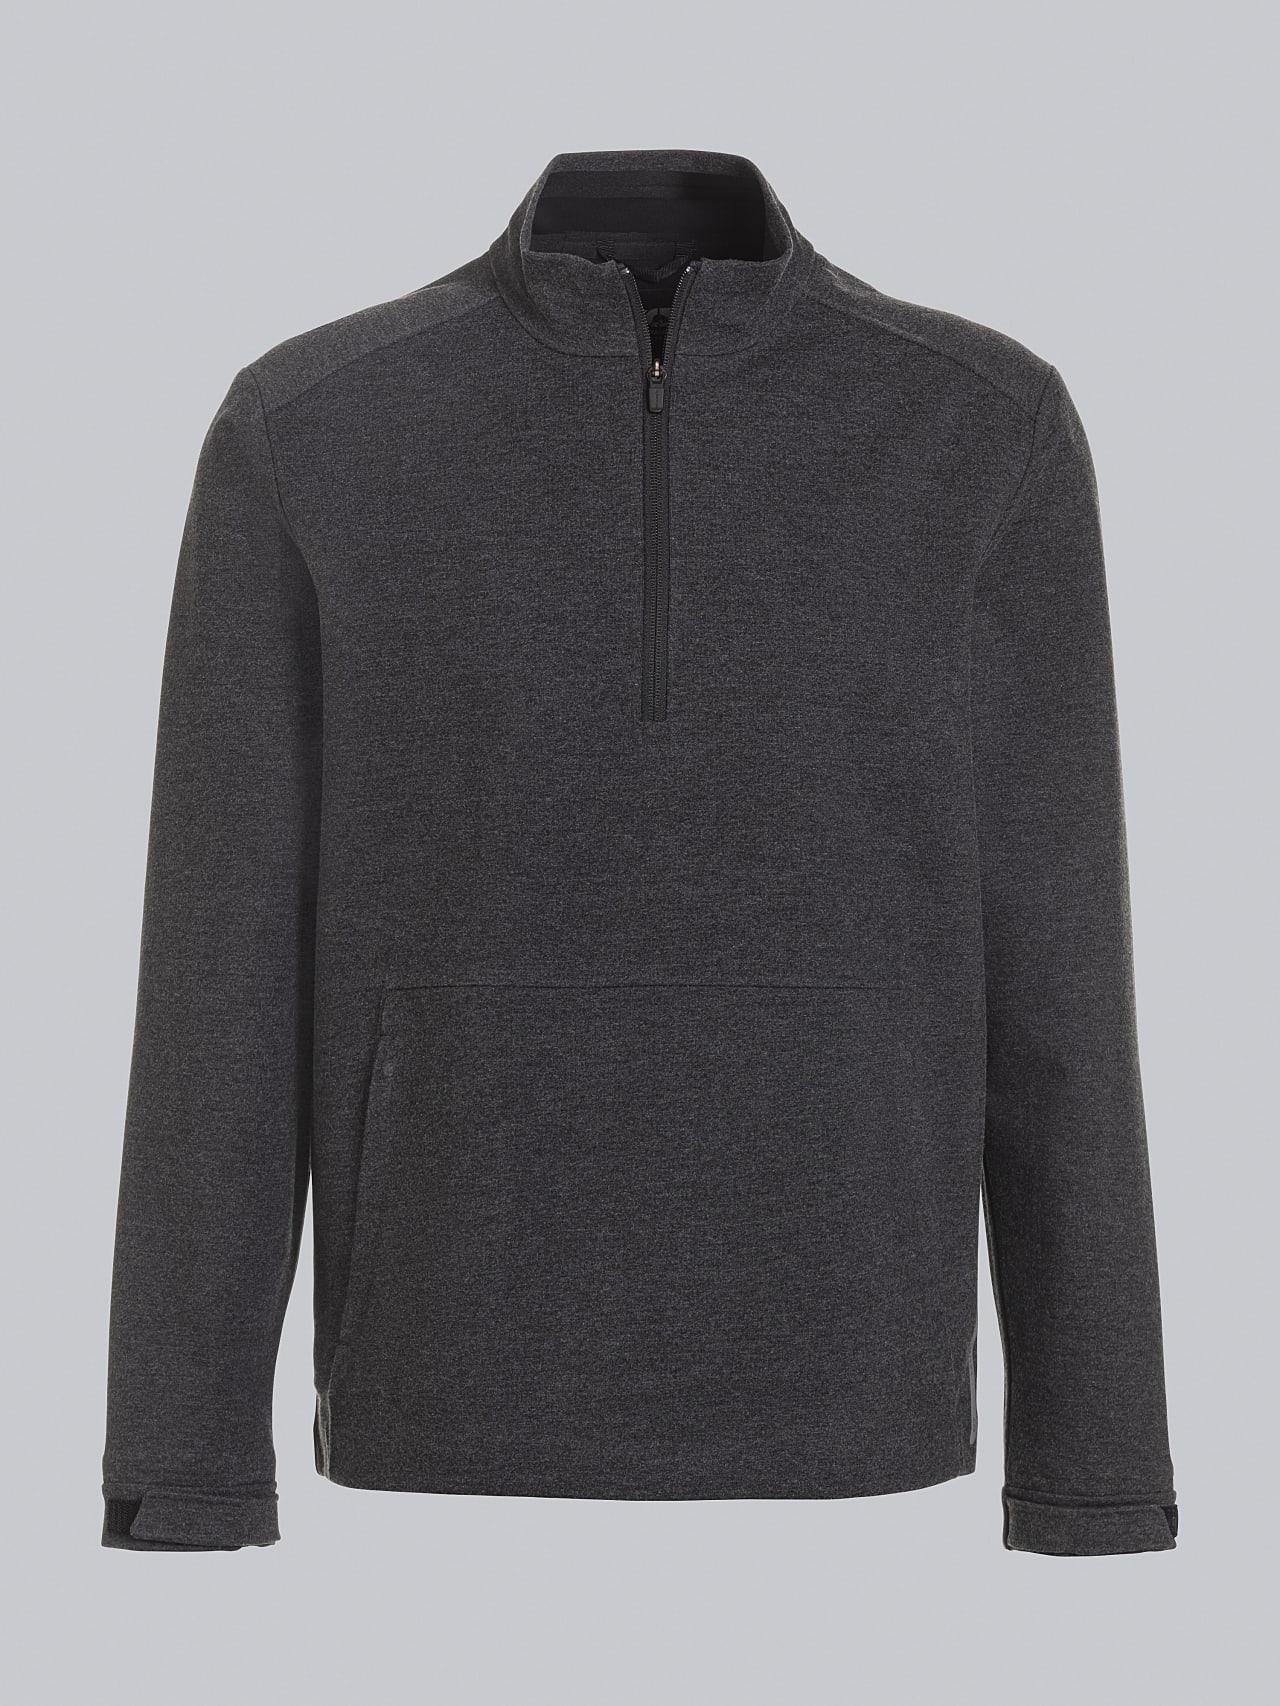 SROTO V1.Y5.02 Waterproof Half-Zip Sweatshirt dark grey / anthracite Back Alpha Tauri